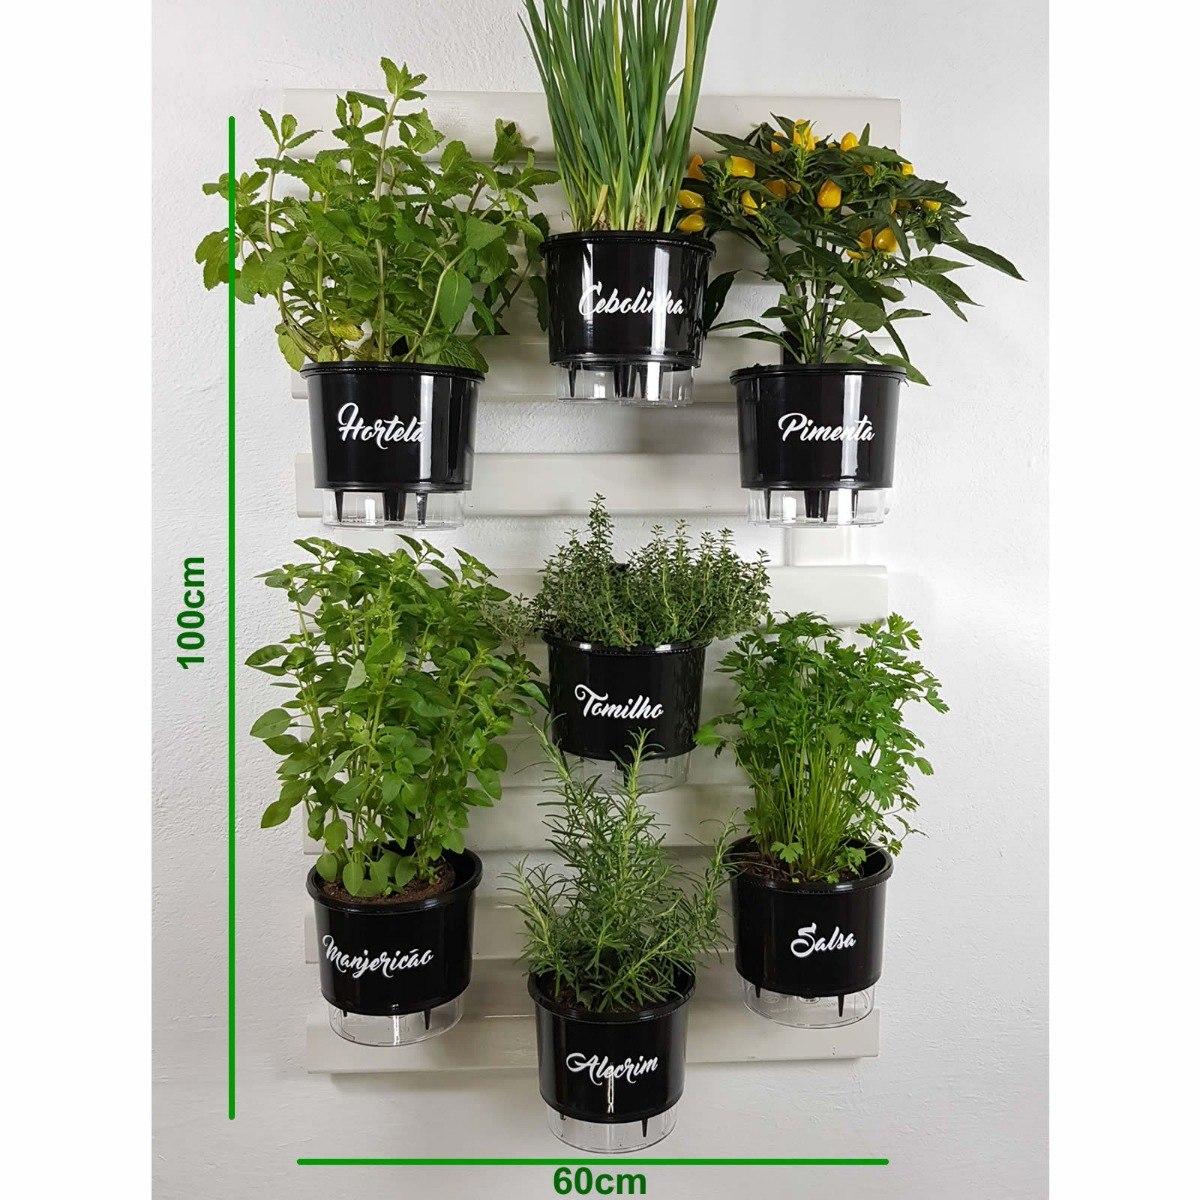 0df9e261c jardim horta vertical treliça branca 100x60 +7 vasos gourmet. Carregando  zoom.